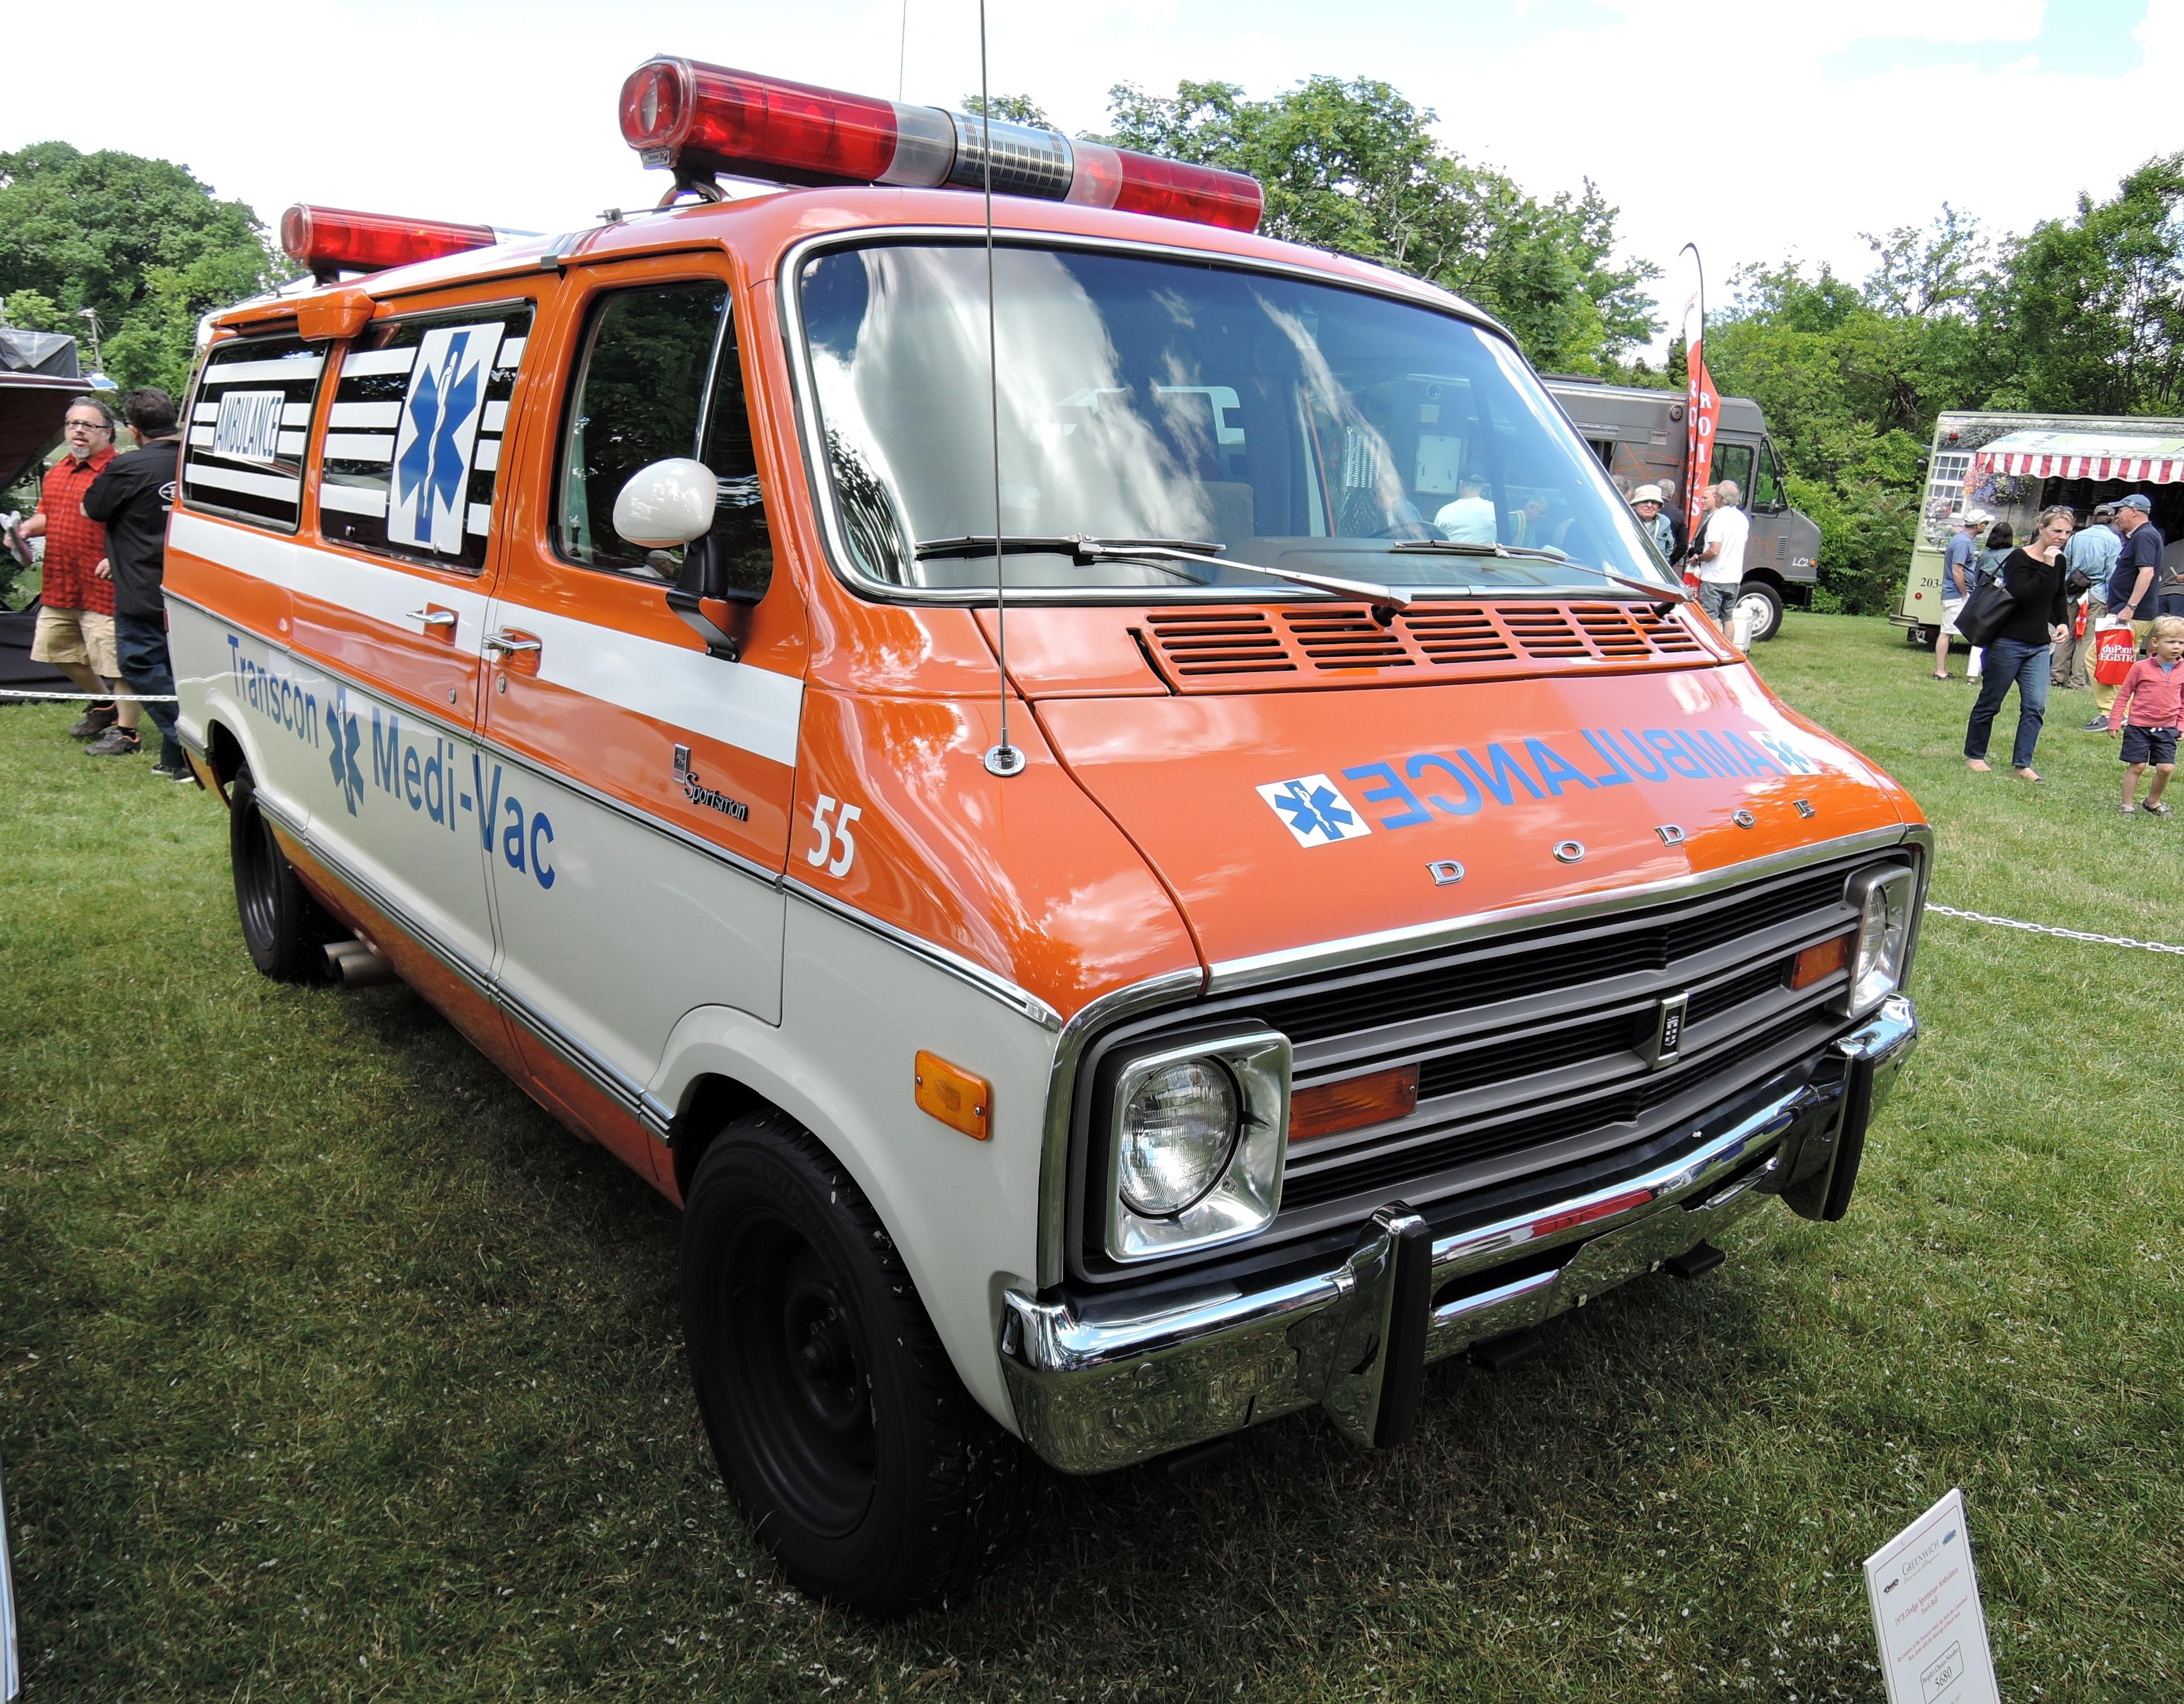 orange/white 1978 Dodge Sportsman Ambulance - Greenwich Concours d'Elegance 2017